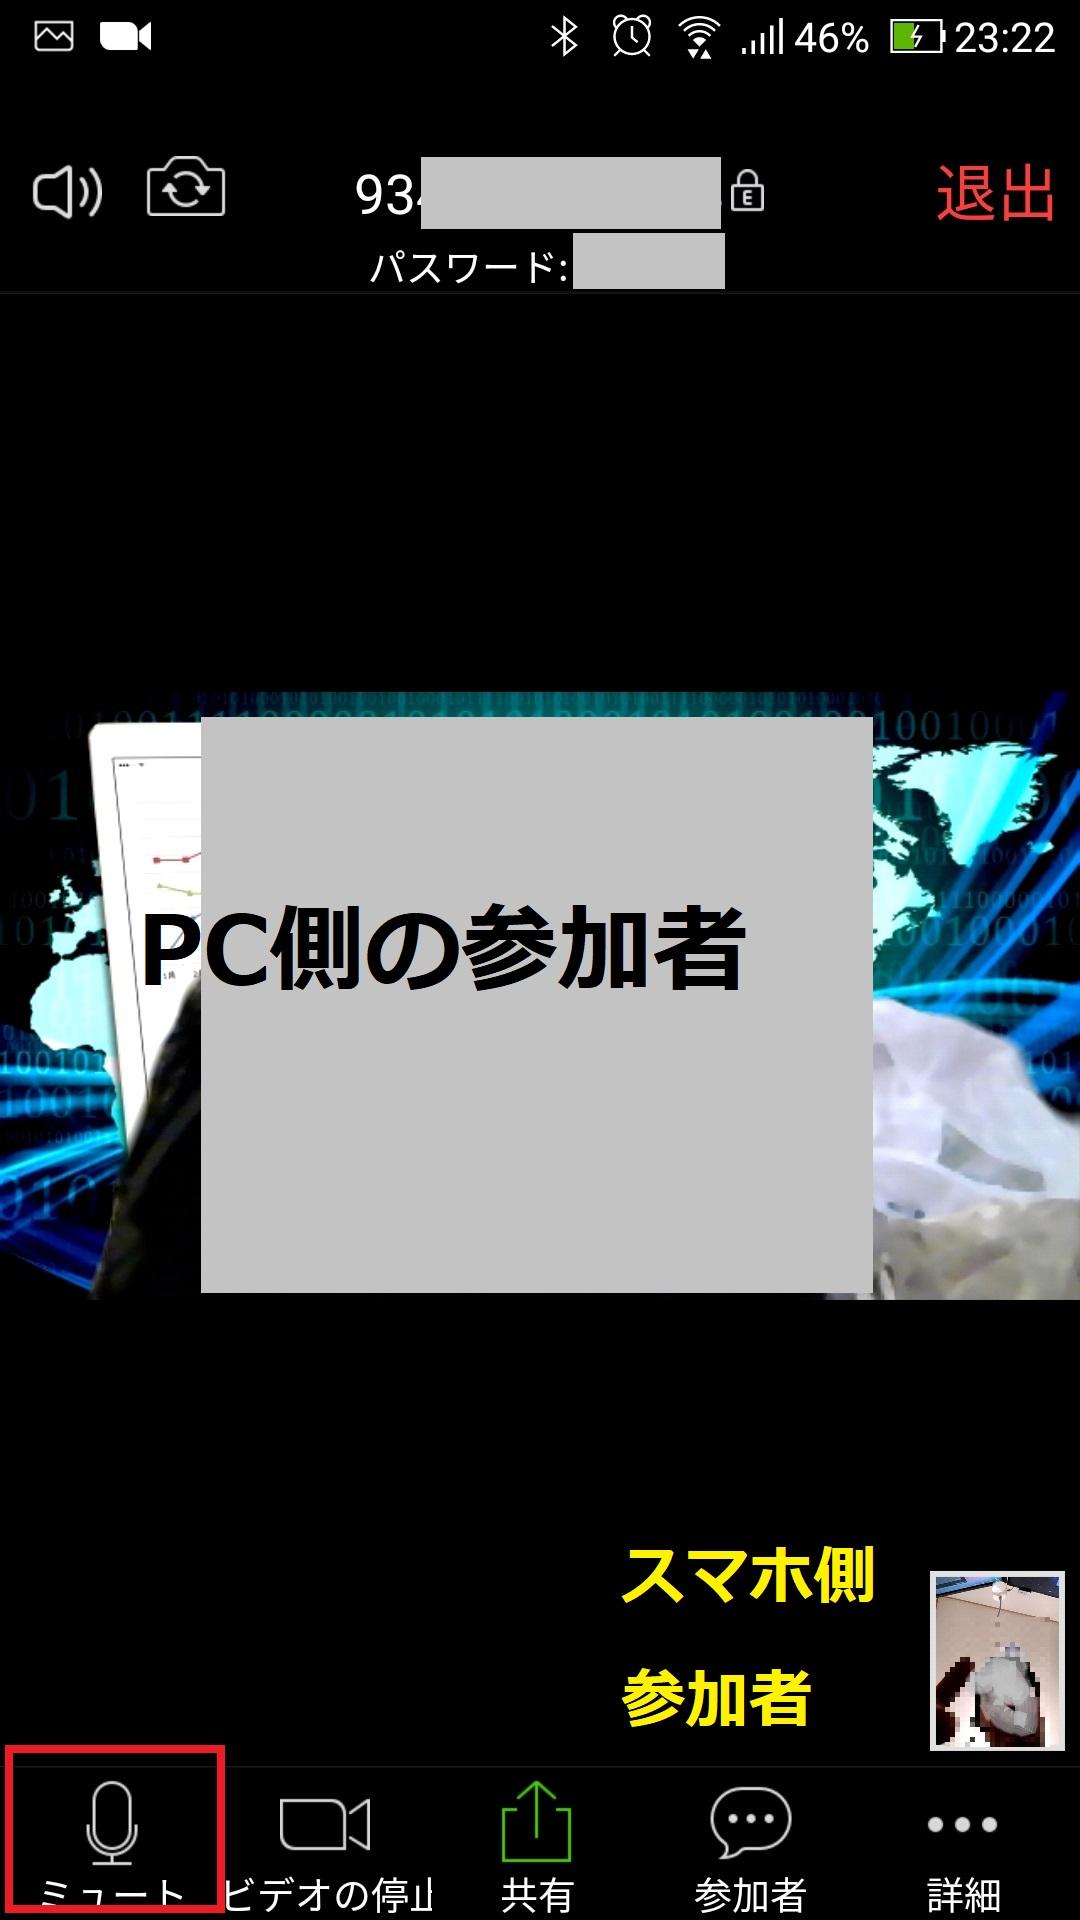 Screenshot 20200416 232244 - Zoomの使い方~一人で総合セルフチェック(パソコンとスマホを使って自分で)